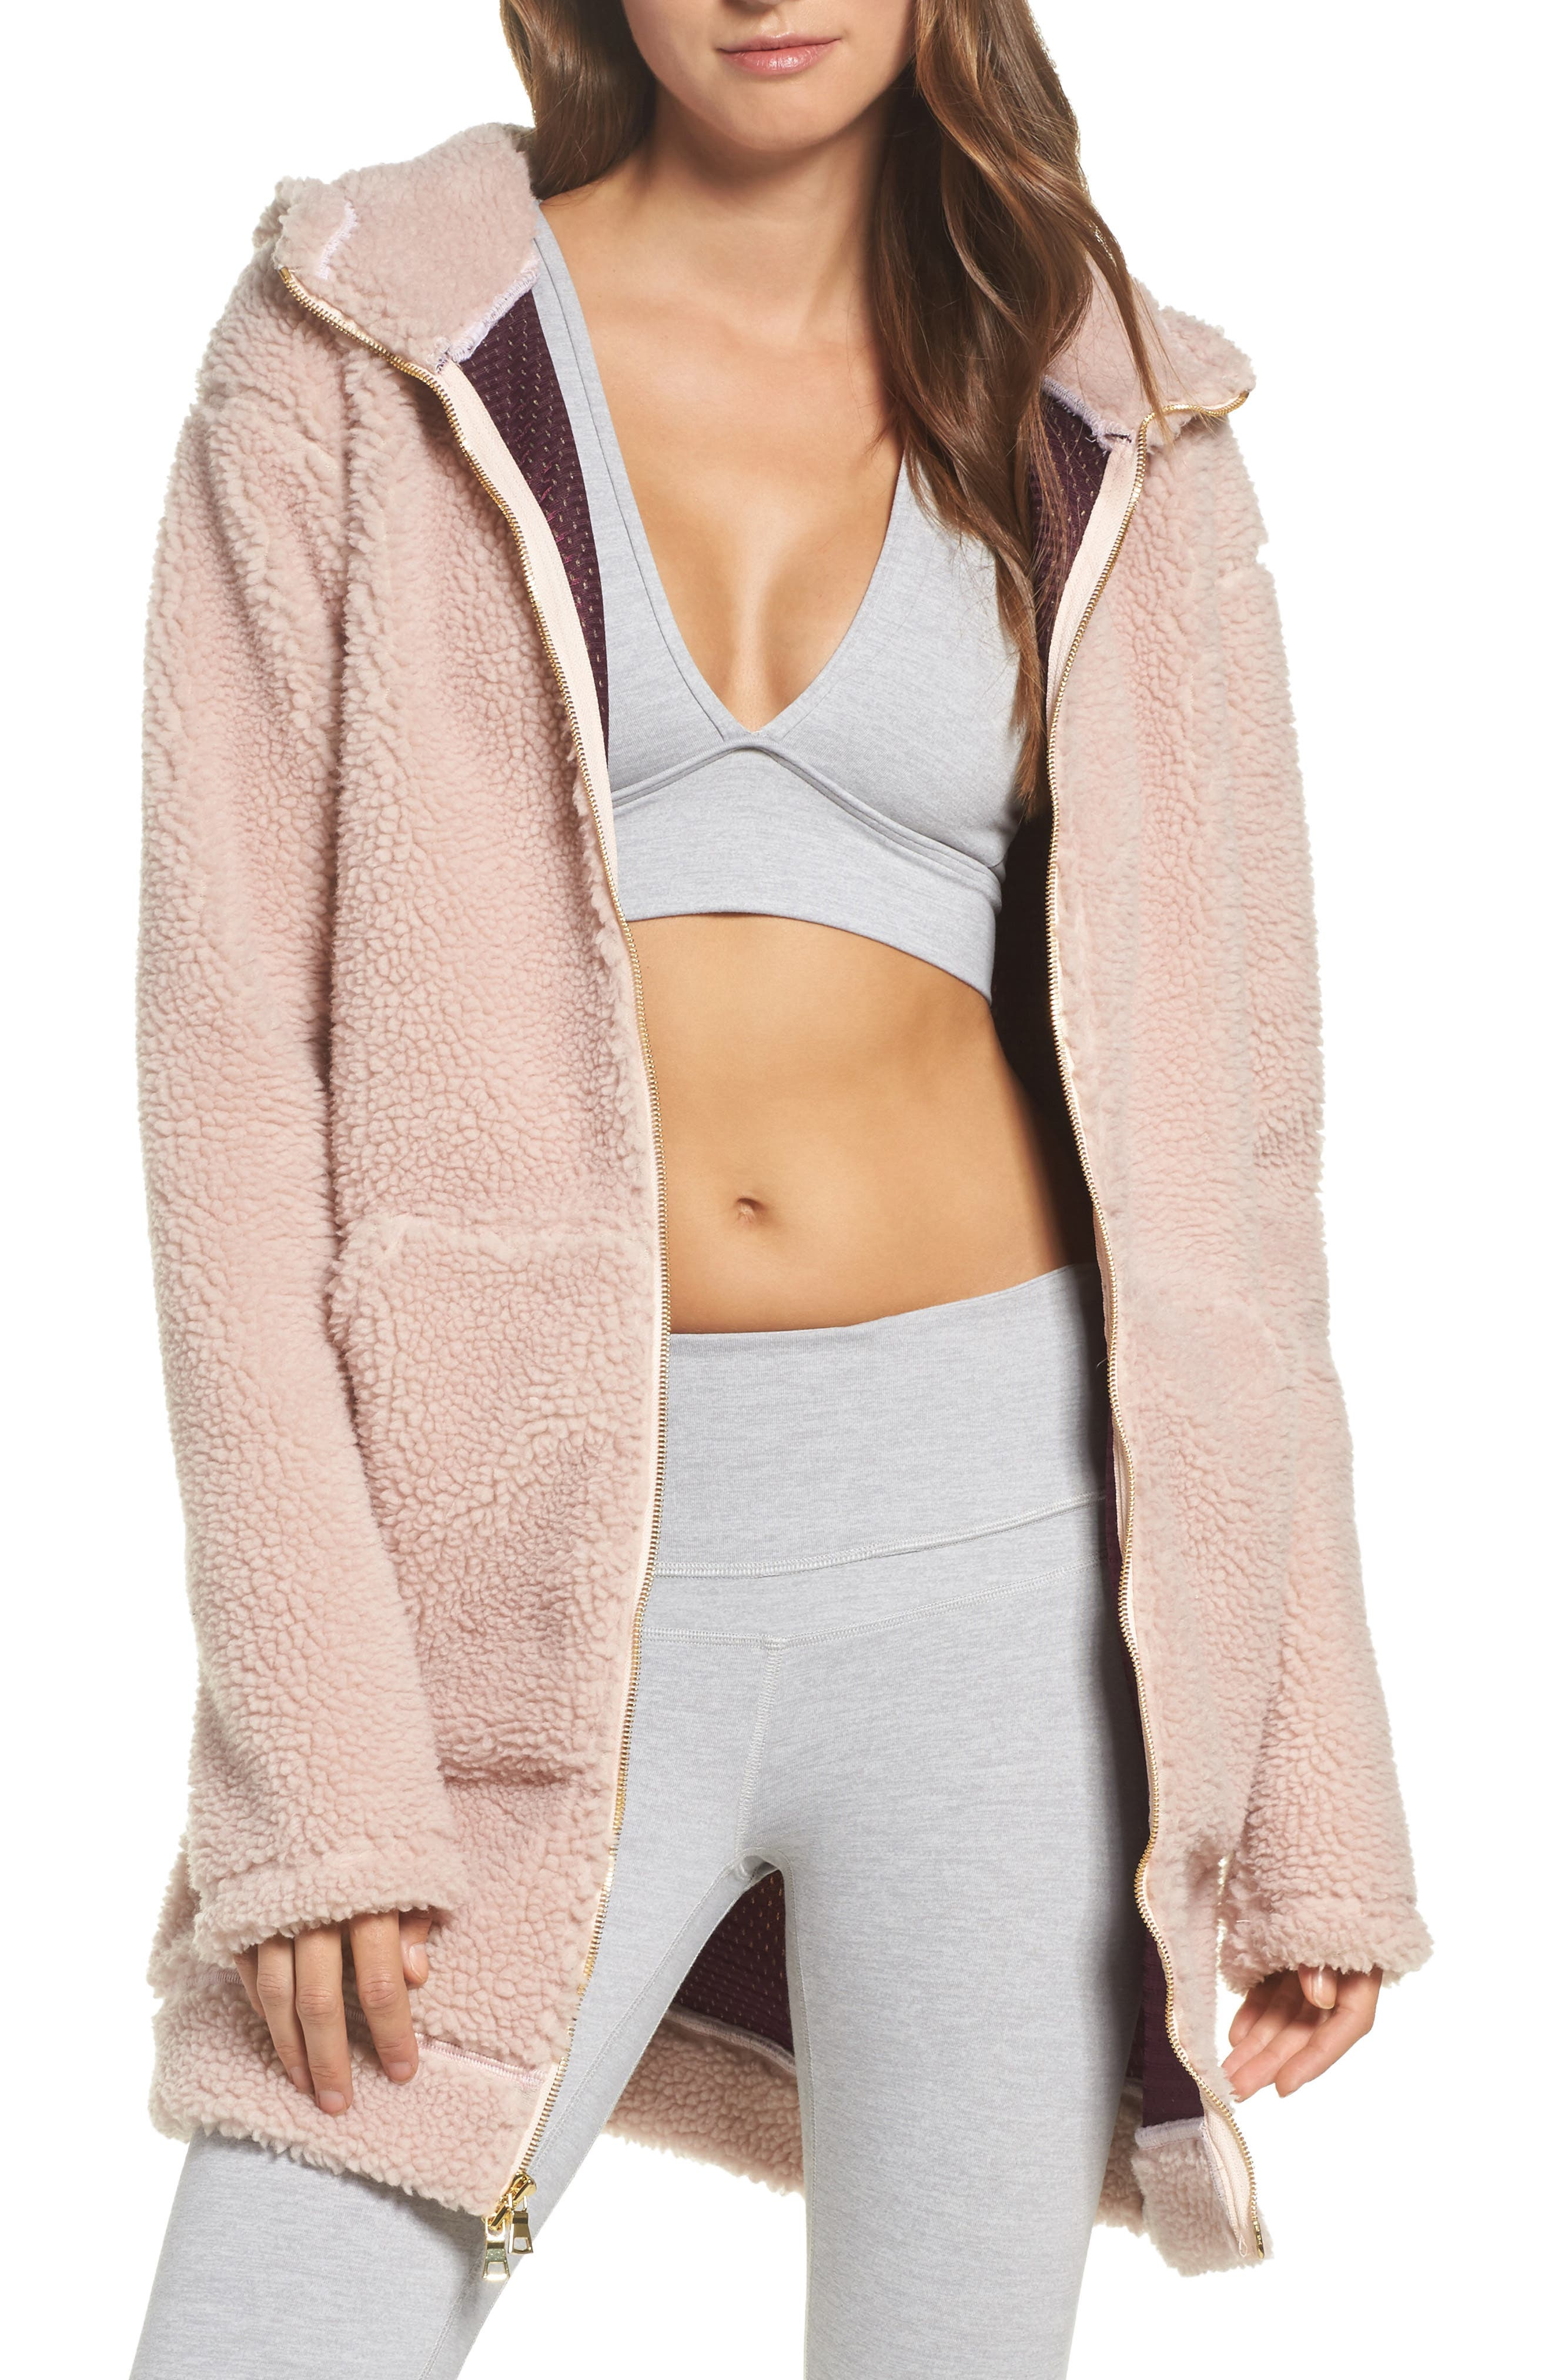 Varley Brea Fleece Jacket